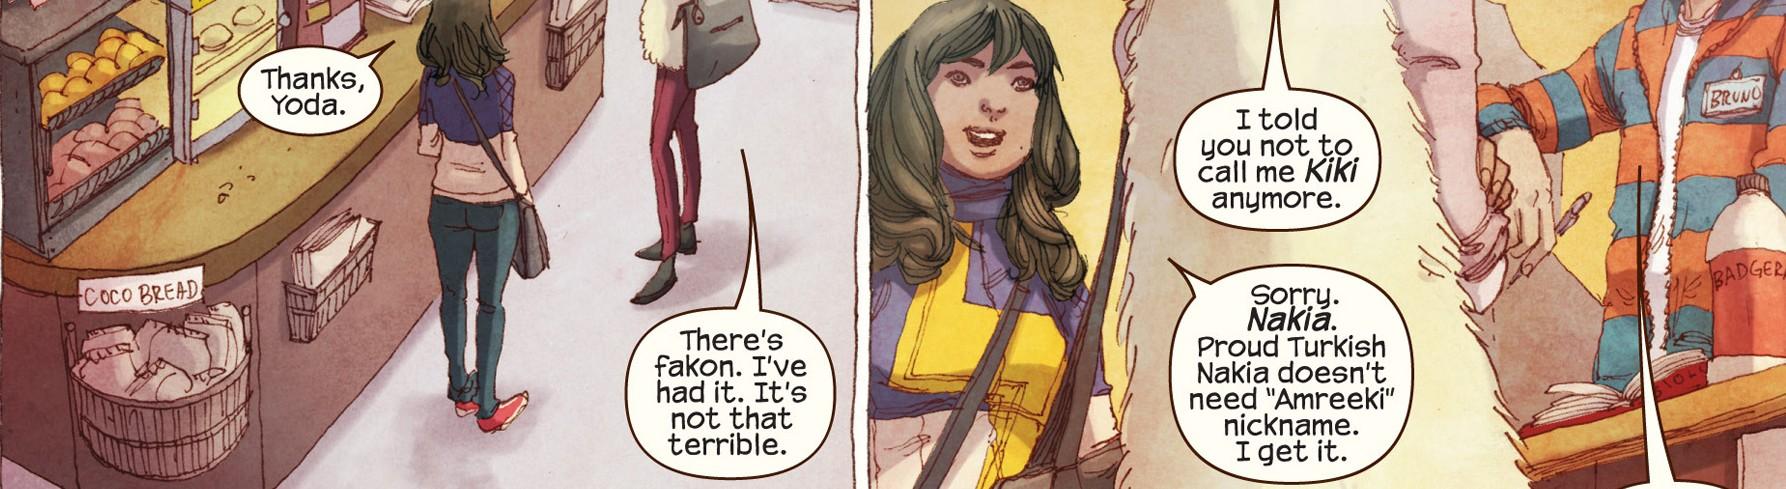 Ms. Marvel 4